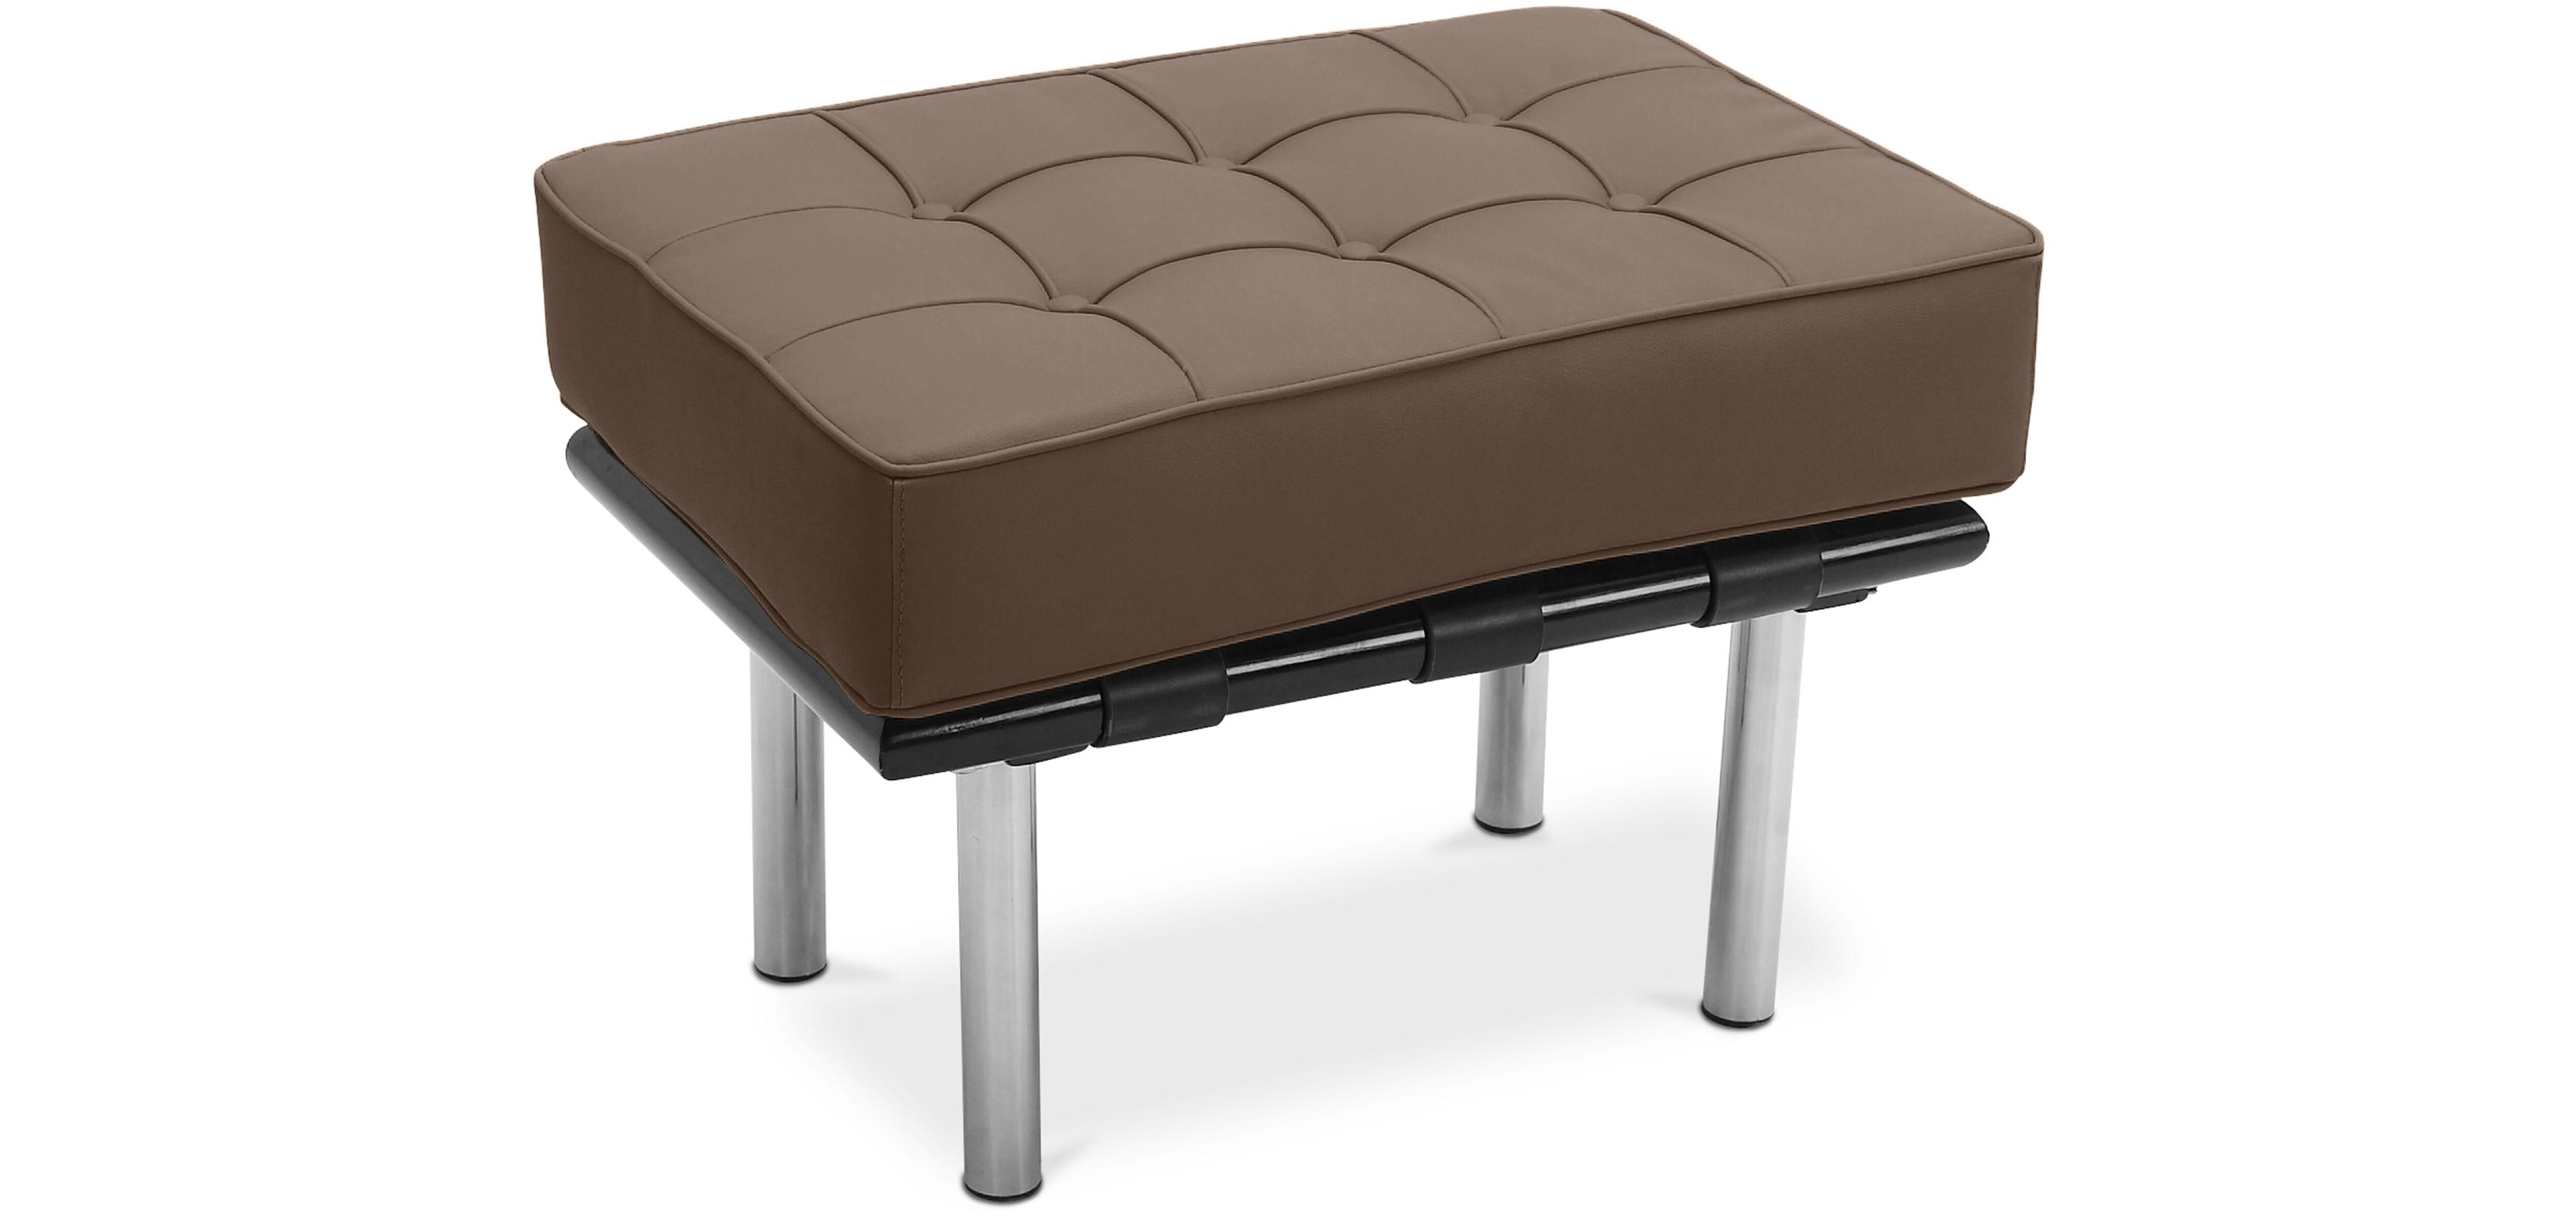 banc barcelona mies van der rohe. Black Bedroom Furniture Sets. Home Design Ideas